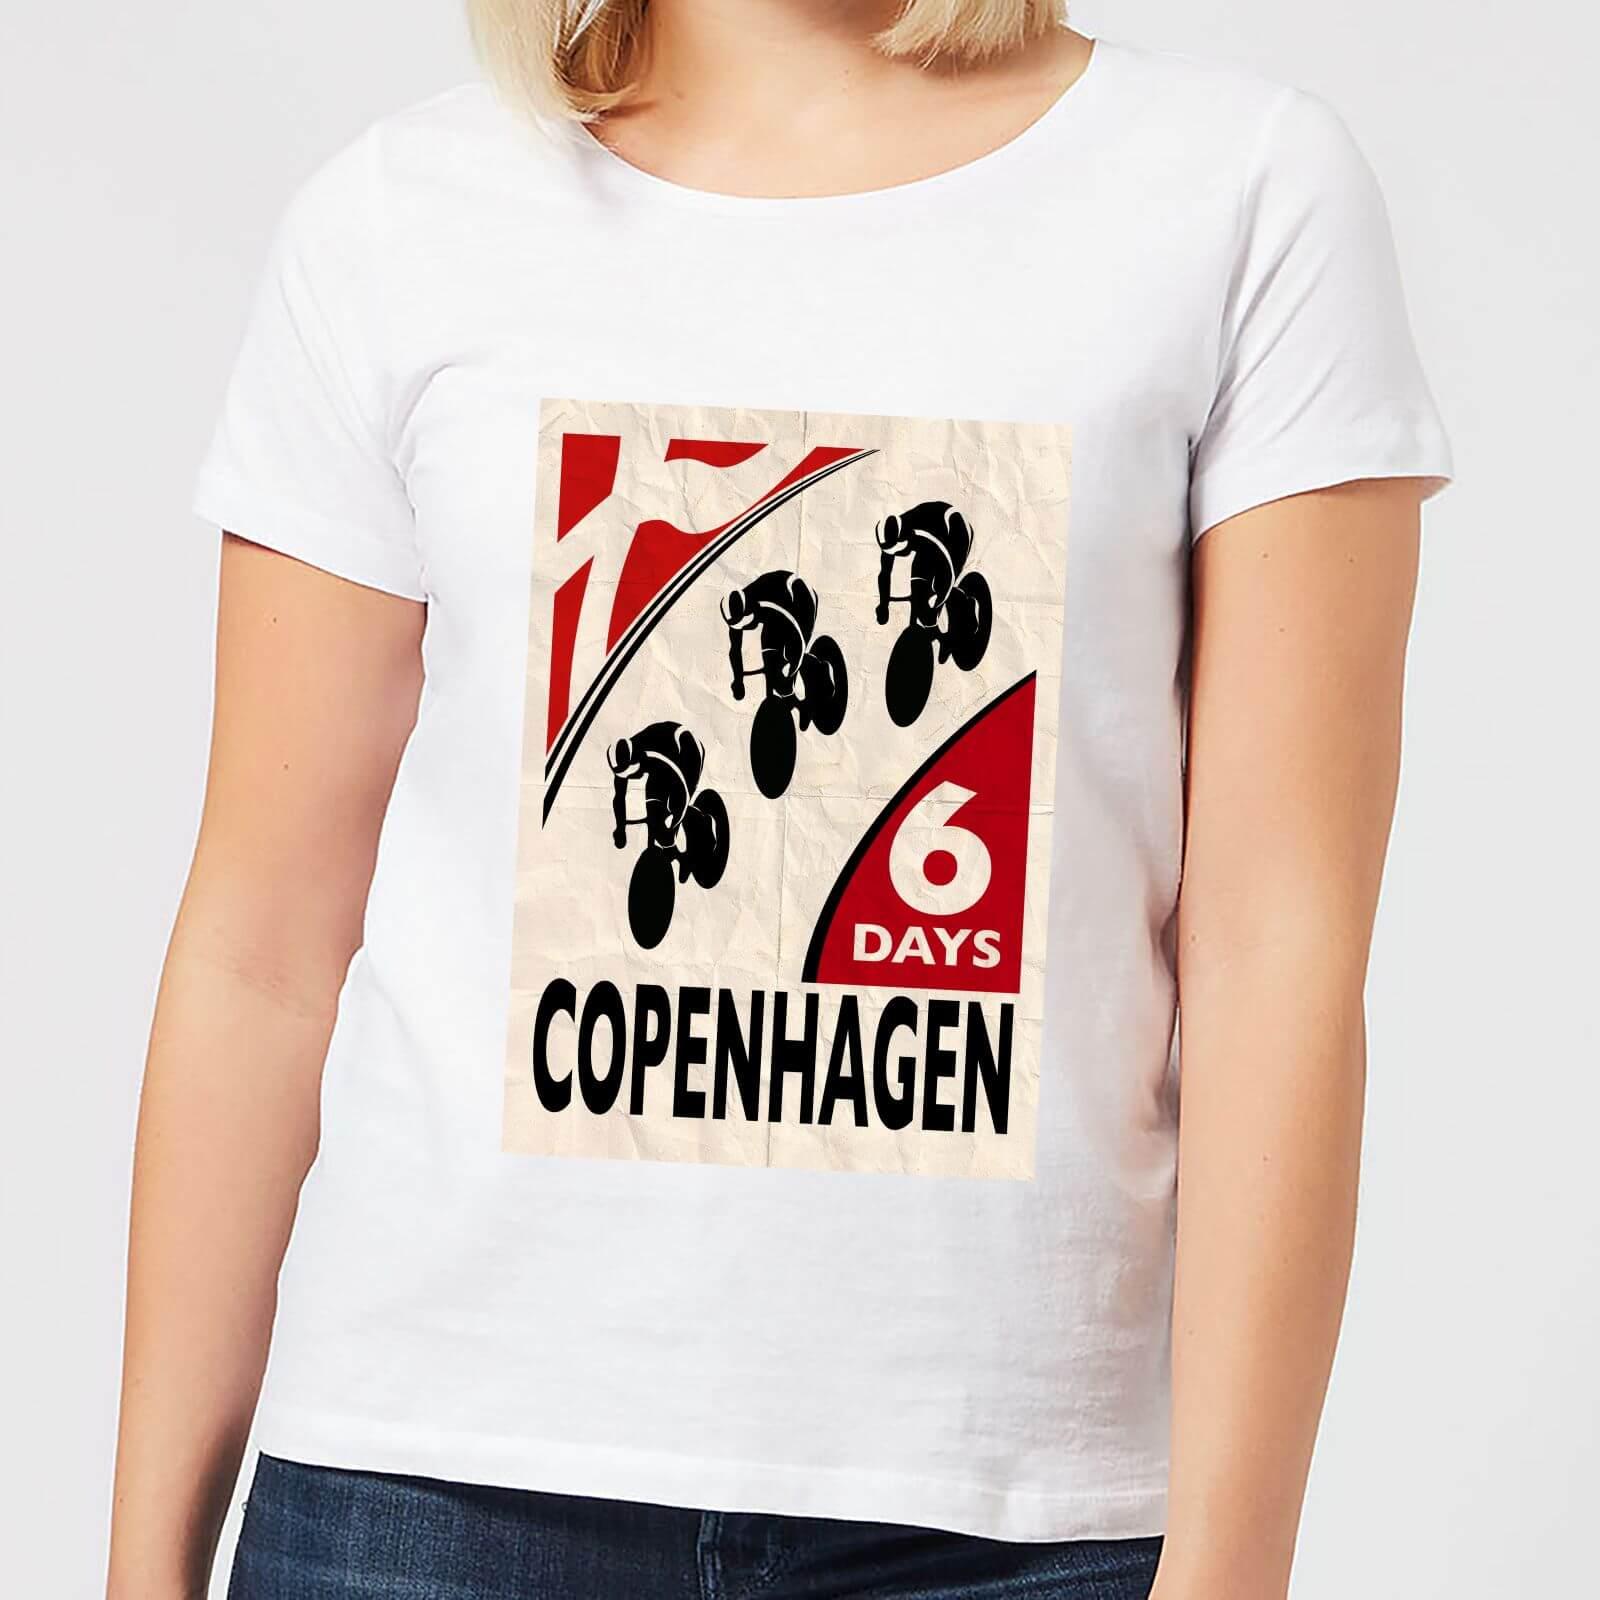 Mark Fairhurst Six Days Copenhagen Women's T-Shirt - White - S - White